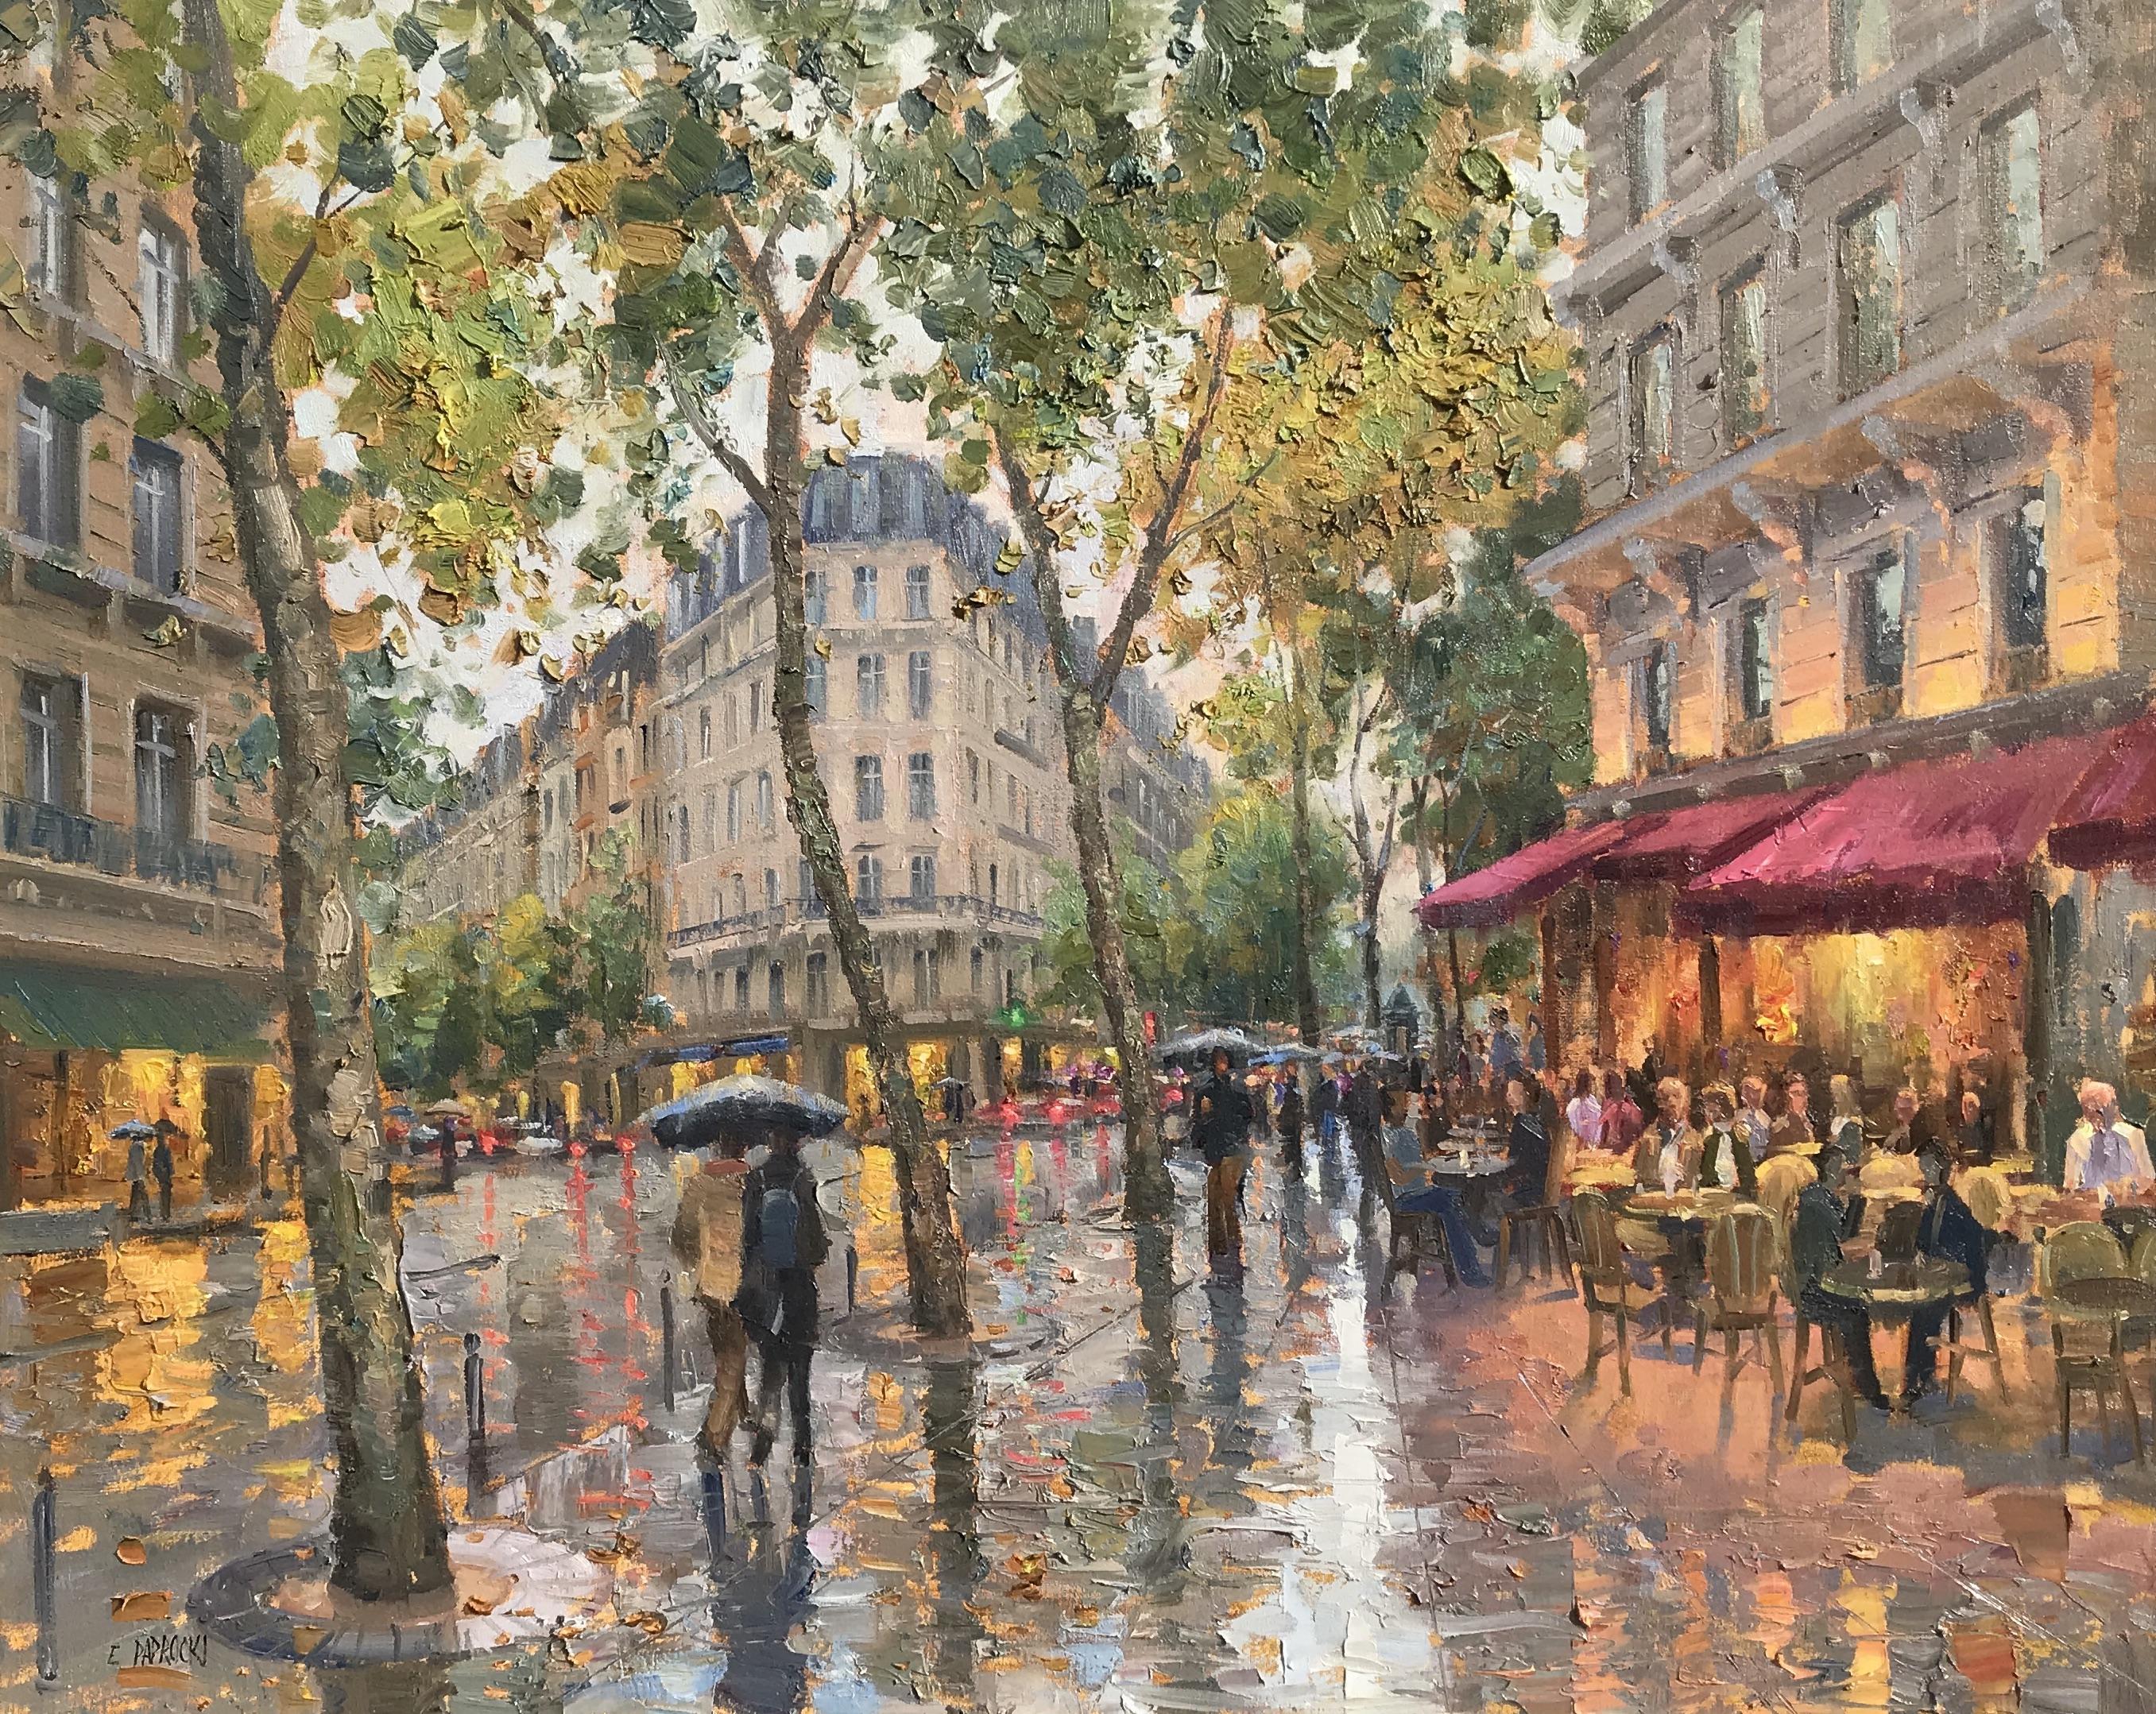 Rainy Afternoon, St. Germain, Paris